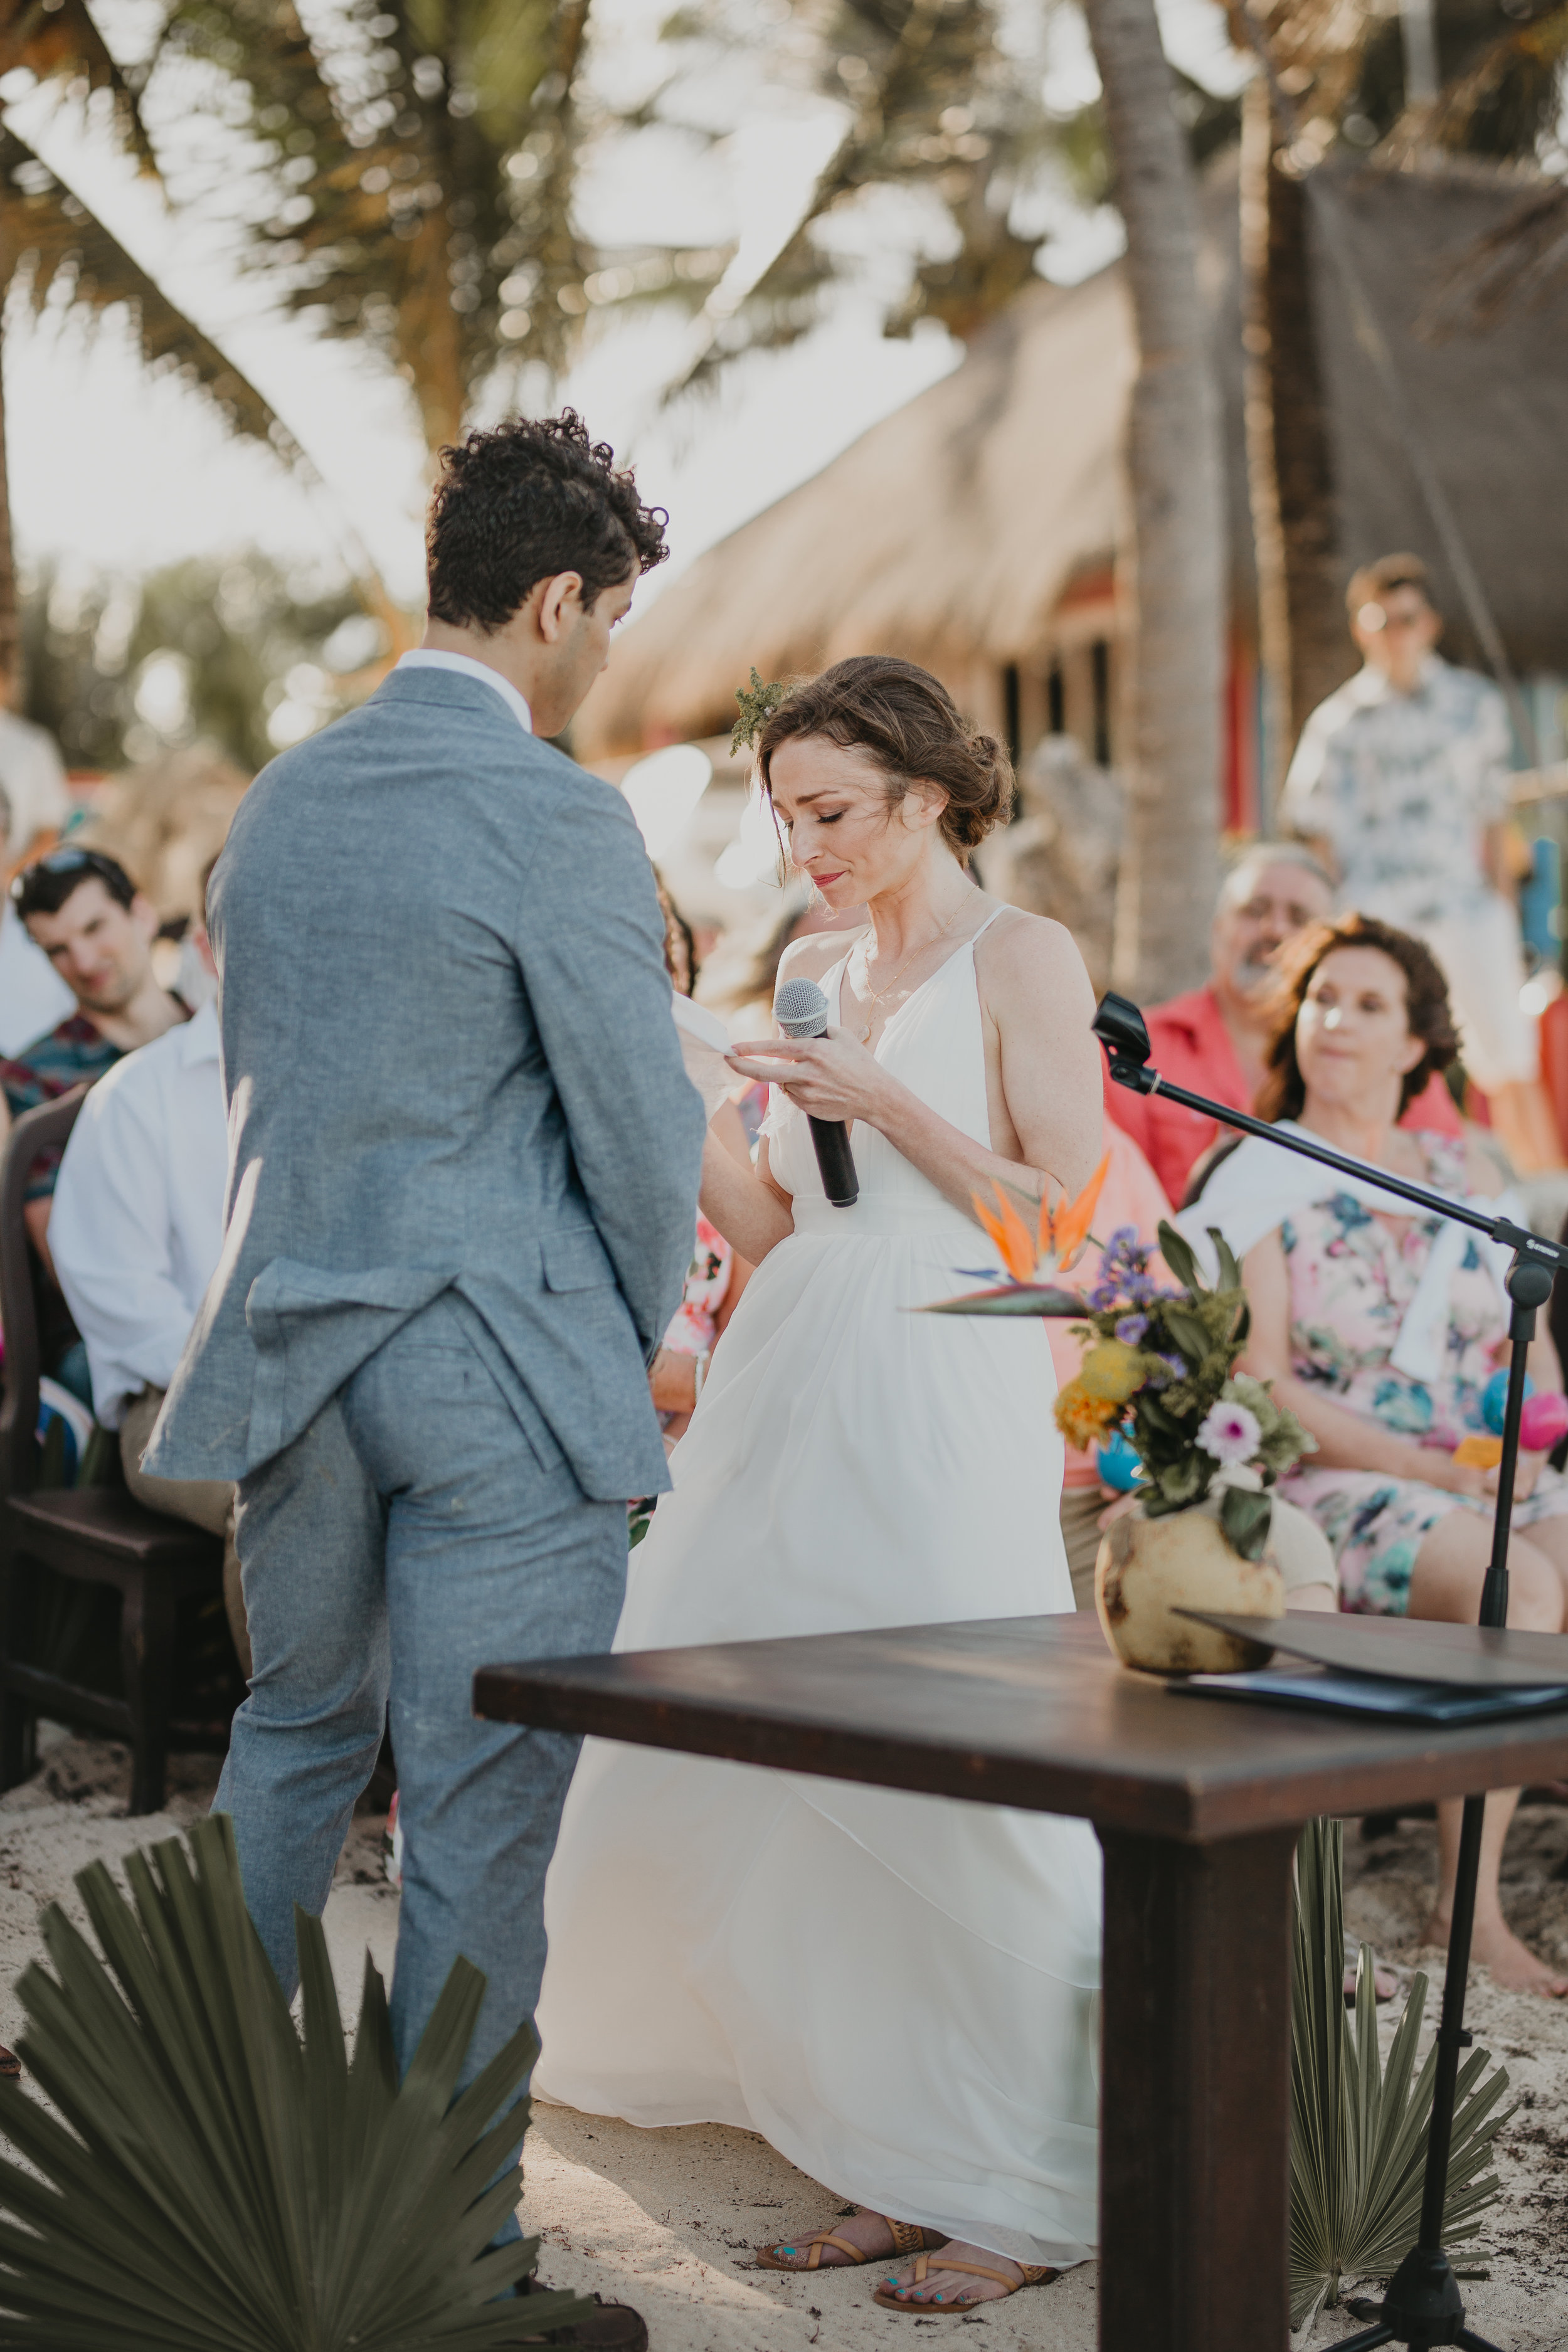 Nicole-Daacke-Photography-beachfront-akumal-destionation-wedding-tulum-mexico-elopement-photographer-destination-wedding-inspiration-sunset-champagne-pop-boho-bride-ocean-tropical-bohemian-tulum-wedding-photos-166.jpg